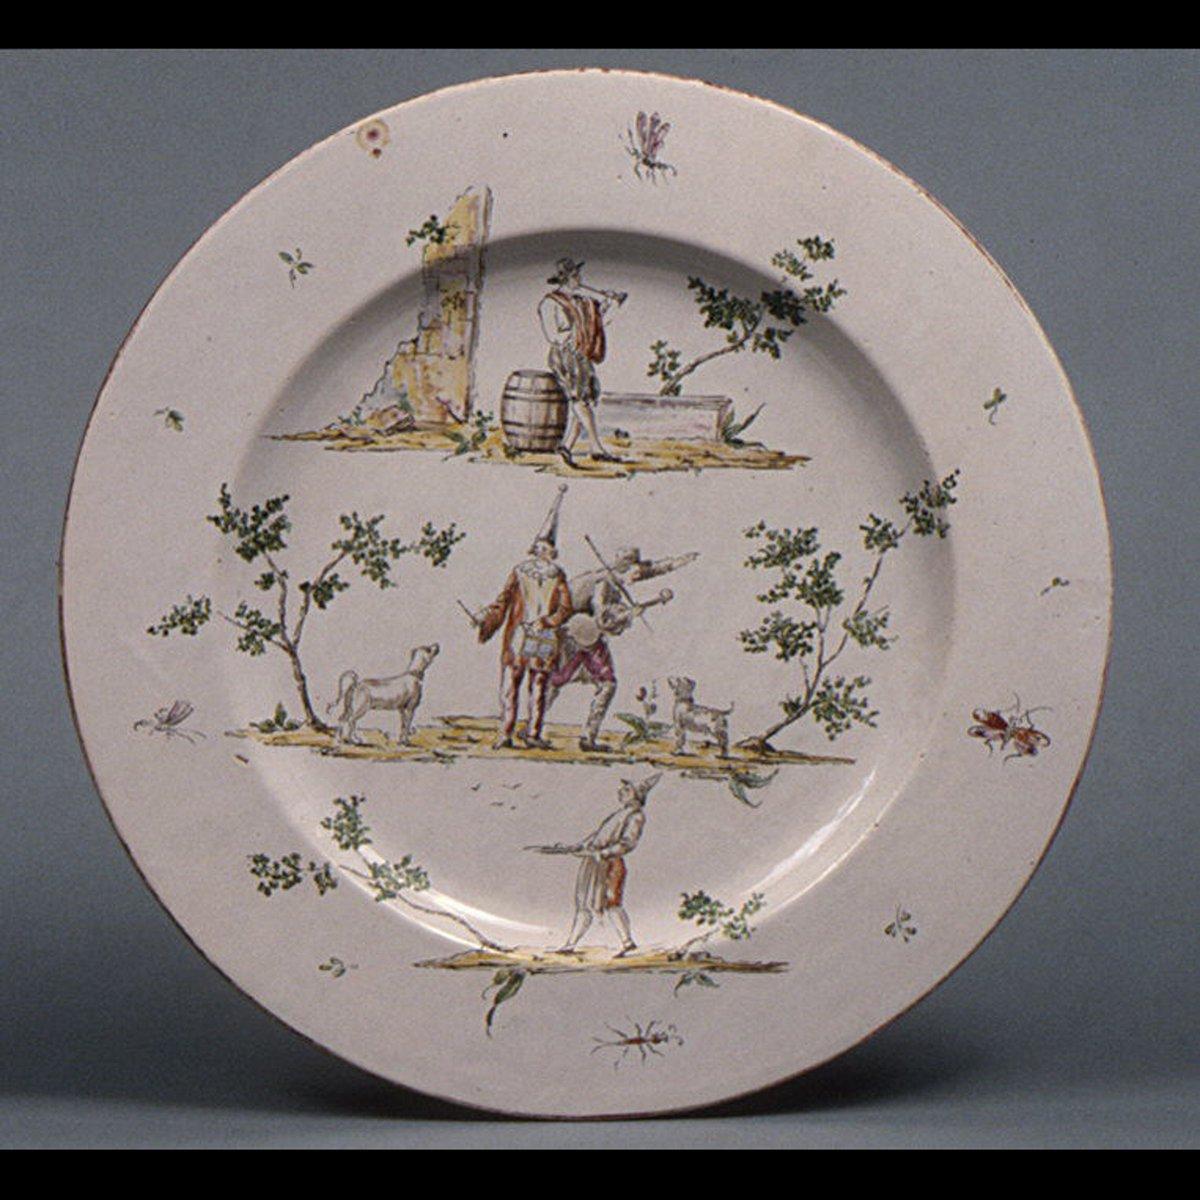 Dish created by: Felice Clerici  #art #artwork #artlover #artaccount #arte #アート #艺术 #FeliceClerici